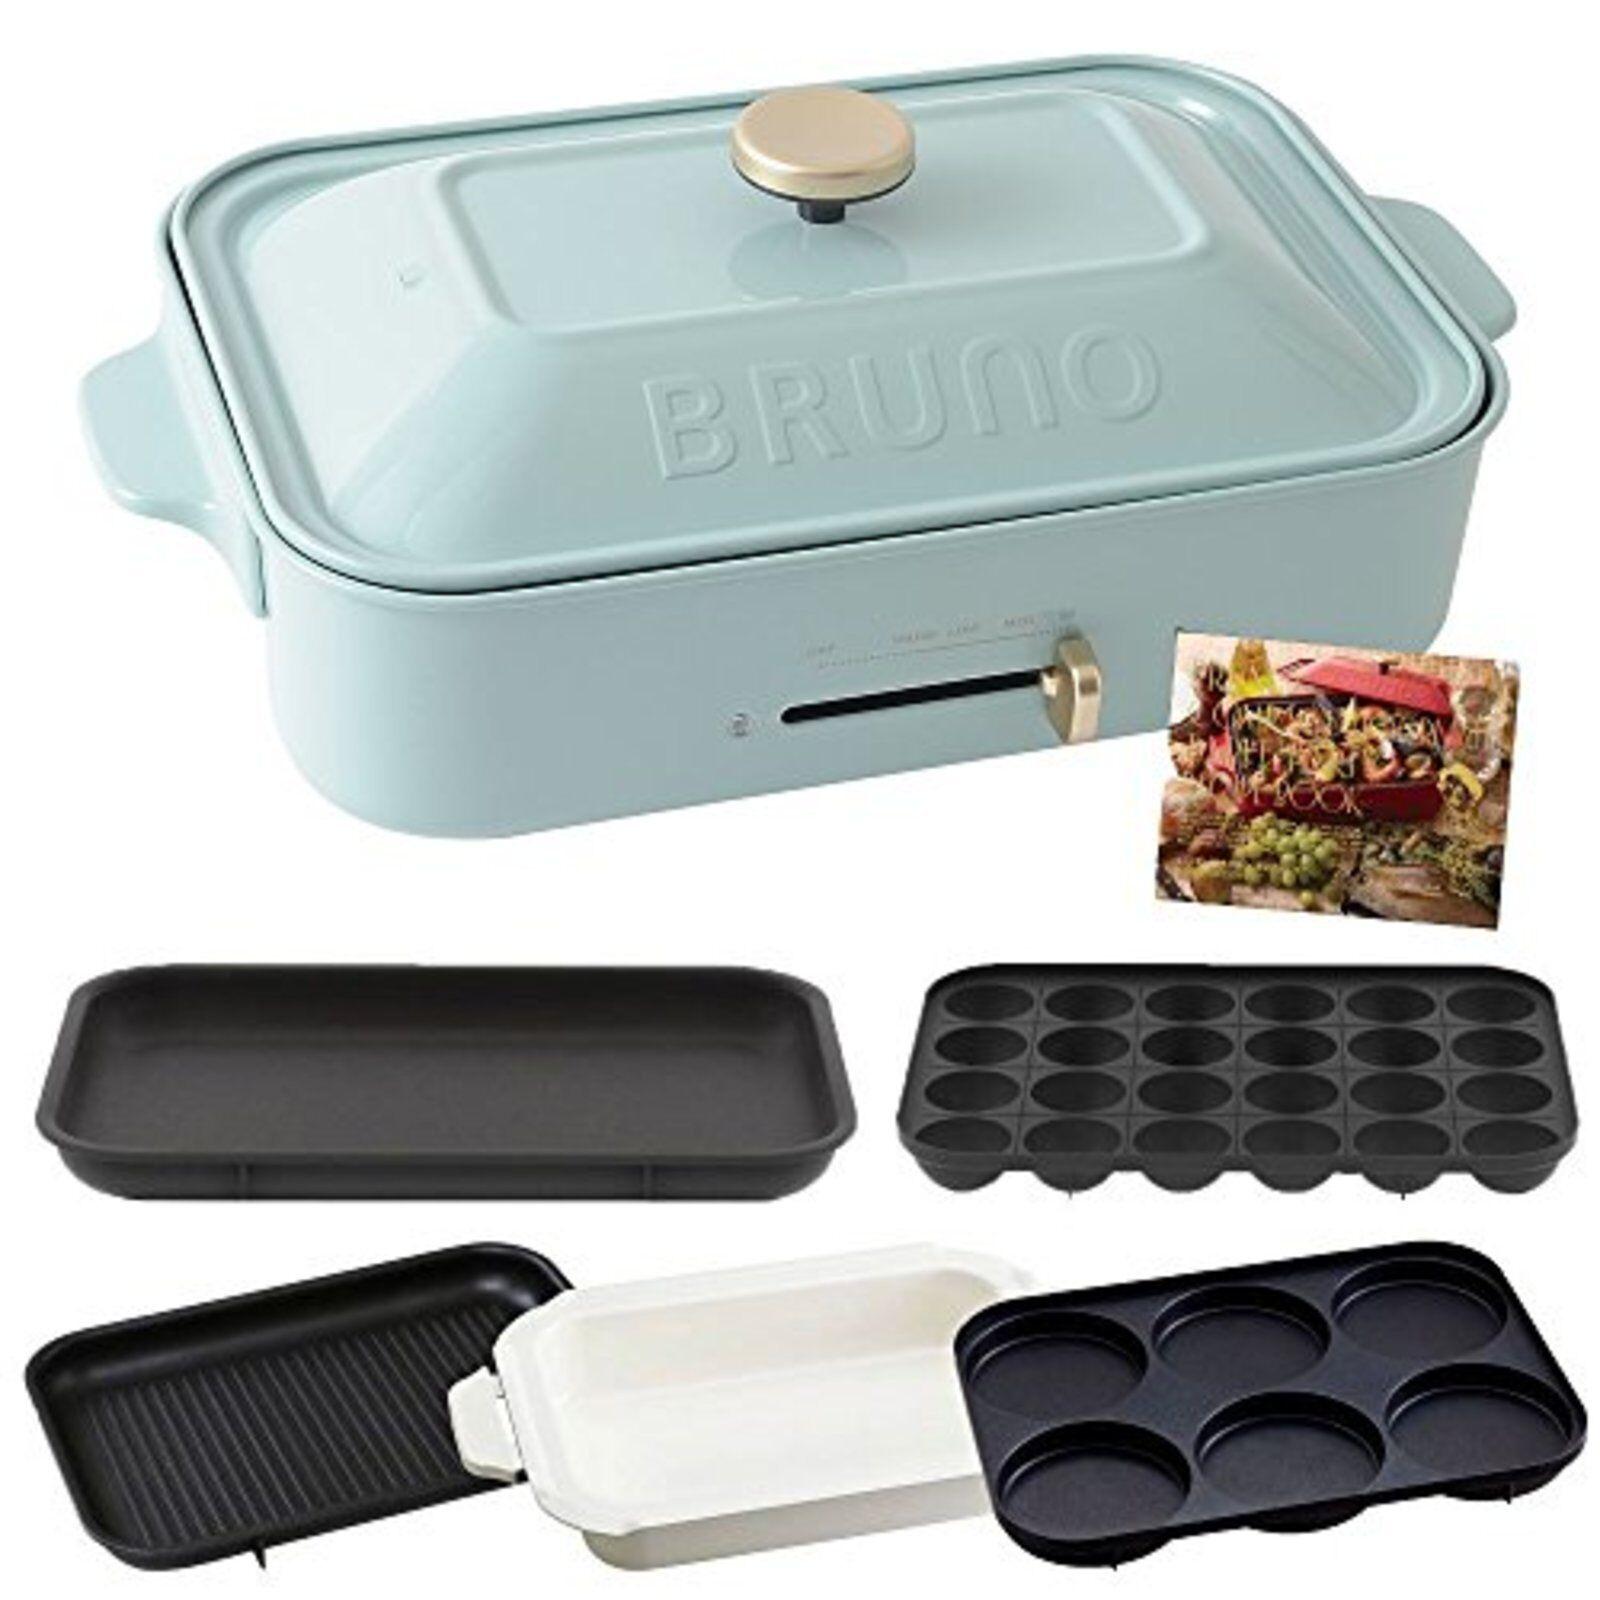 Bruno Compact Hot Plat & Takoyaki & Poêle & Grille & Multi Assiette Boe021 Bleu